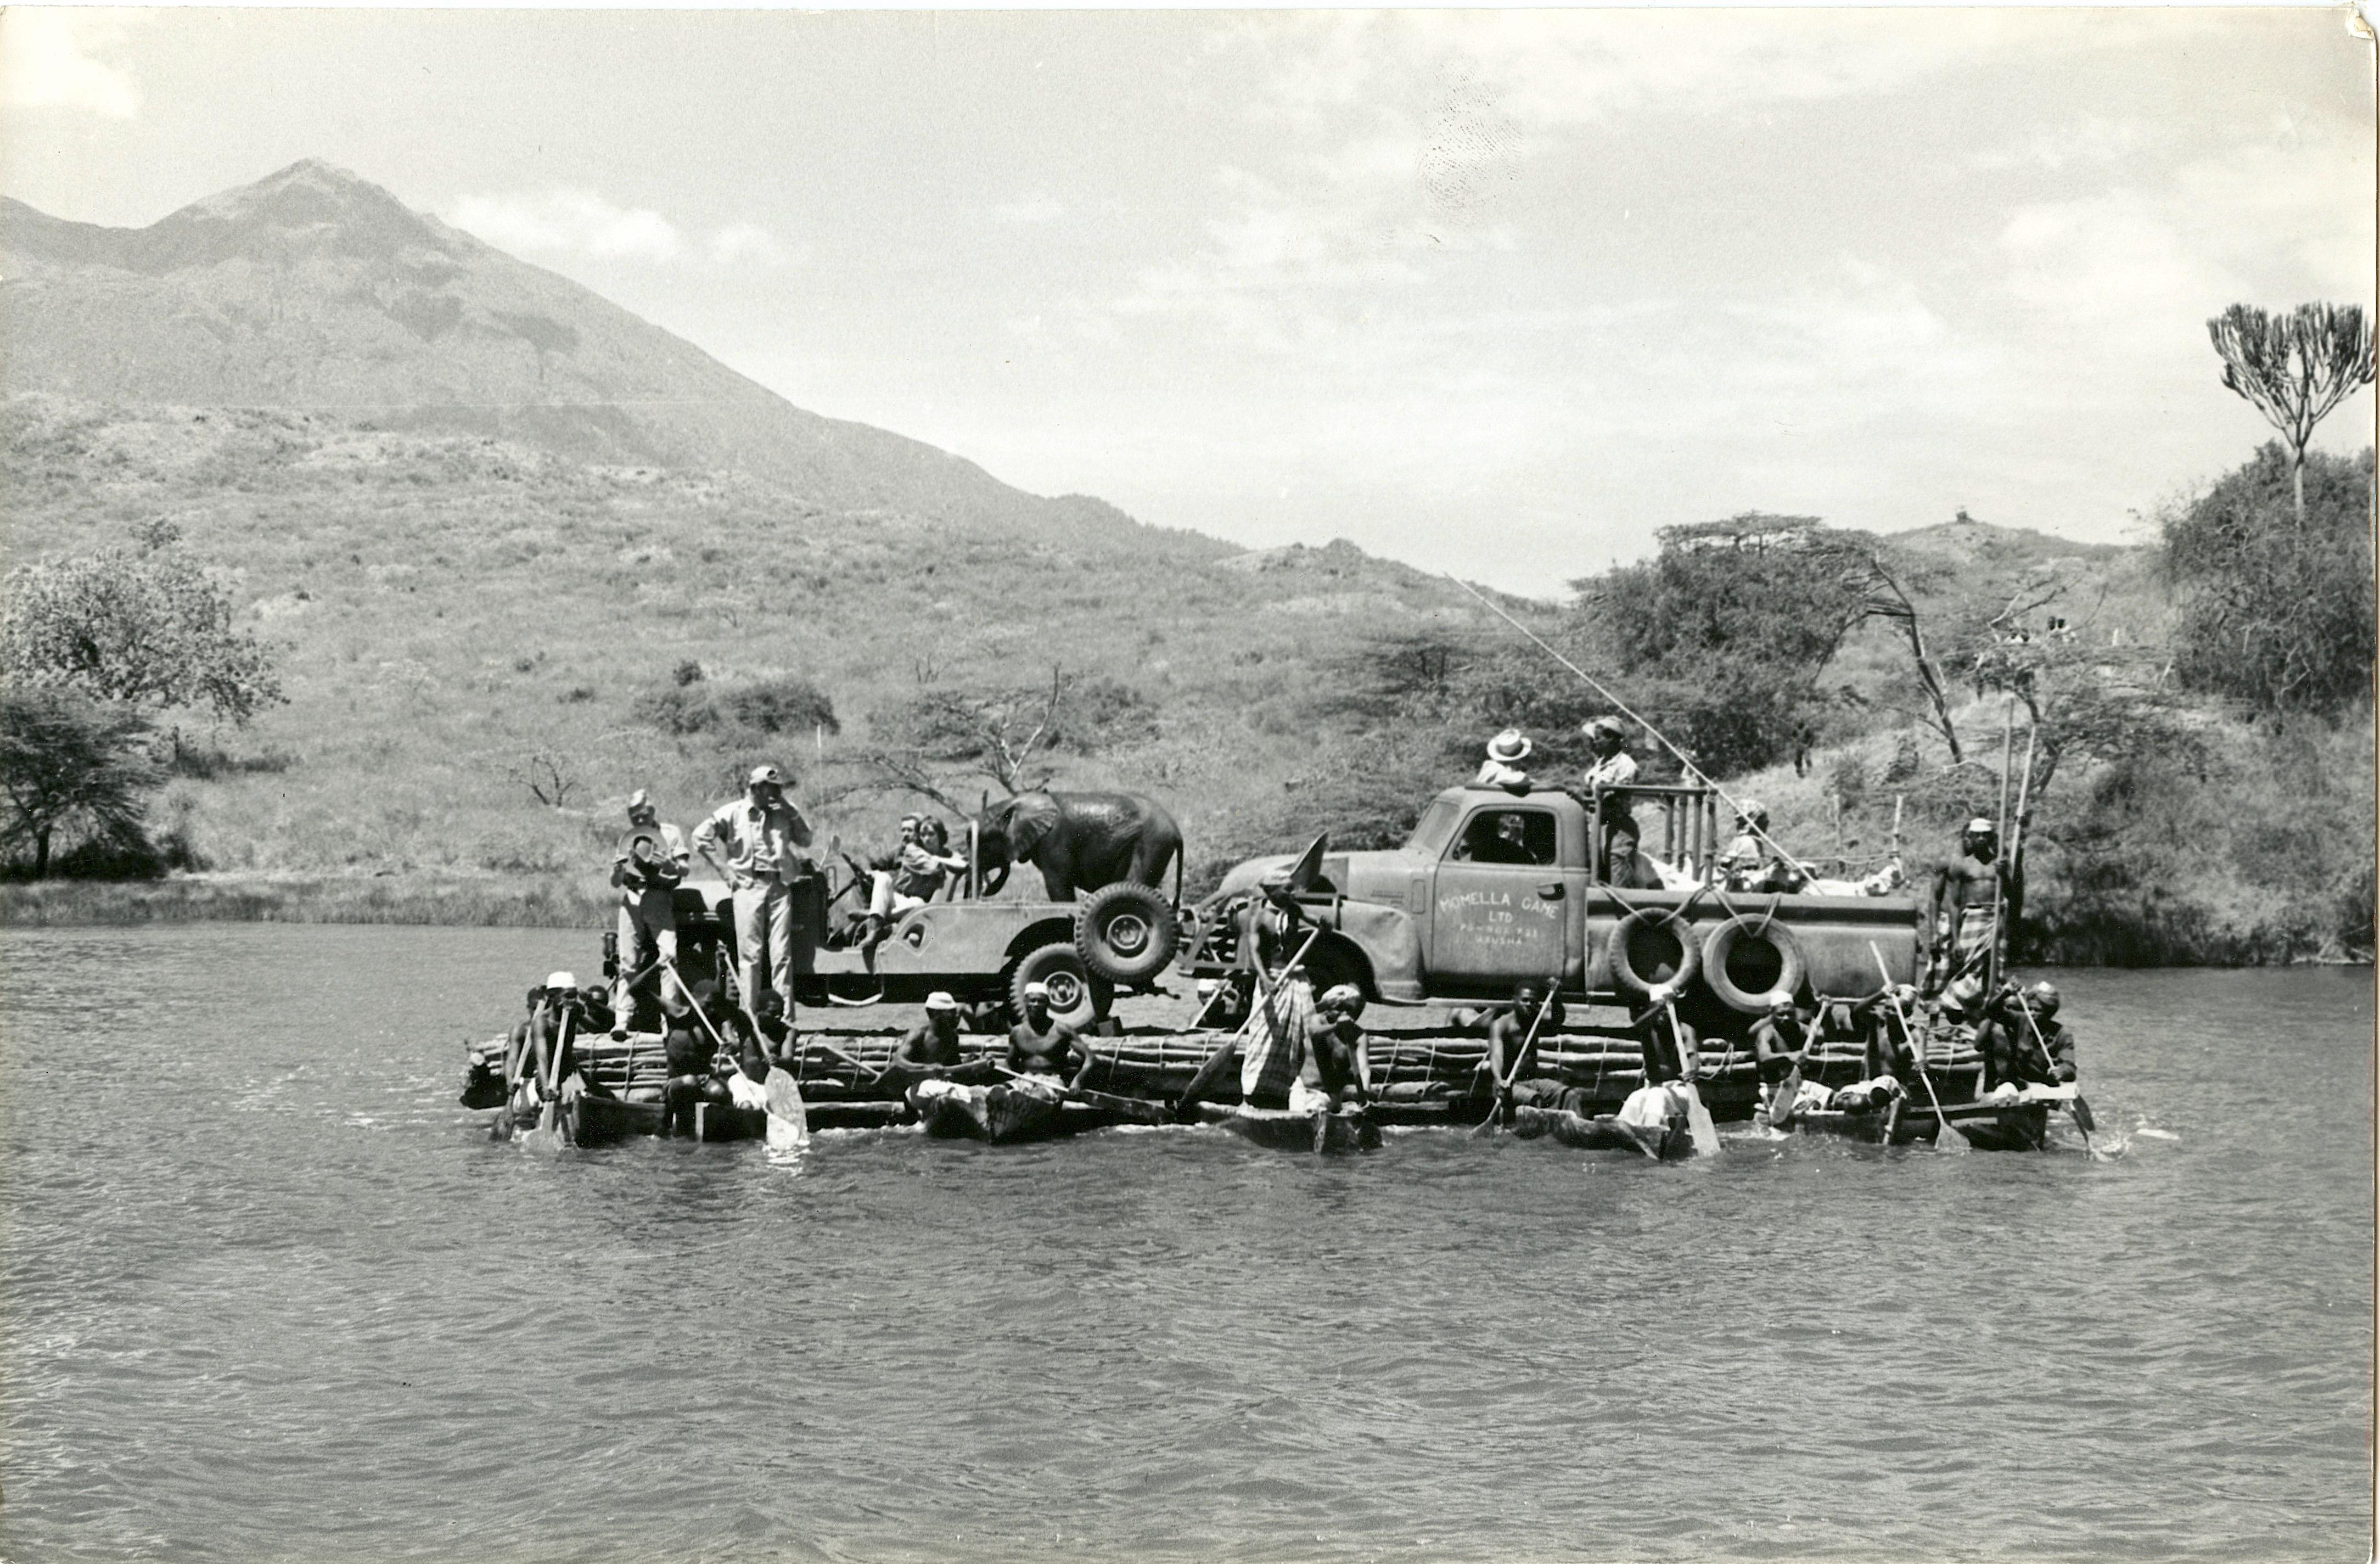 Antique / Vintage Historical Photograph African River Transport